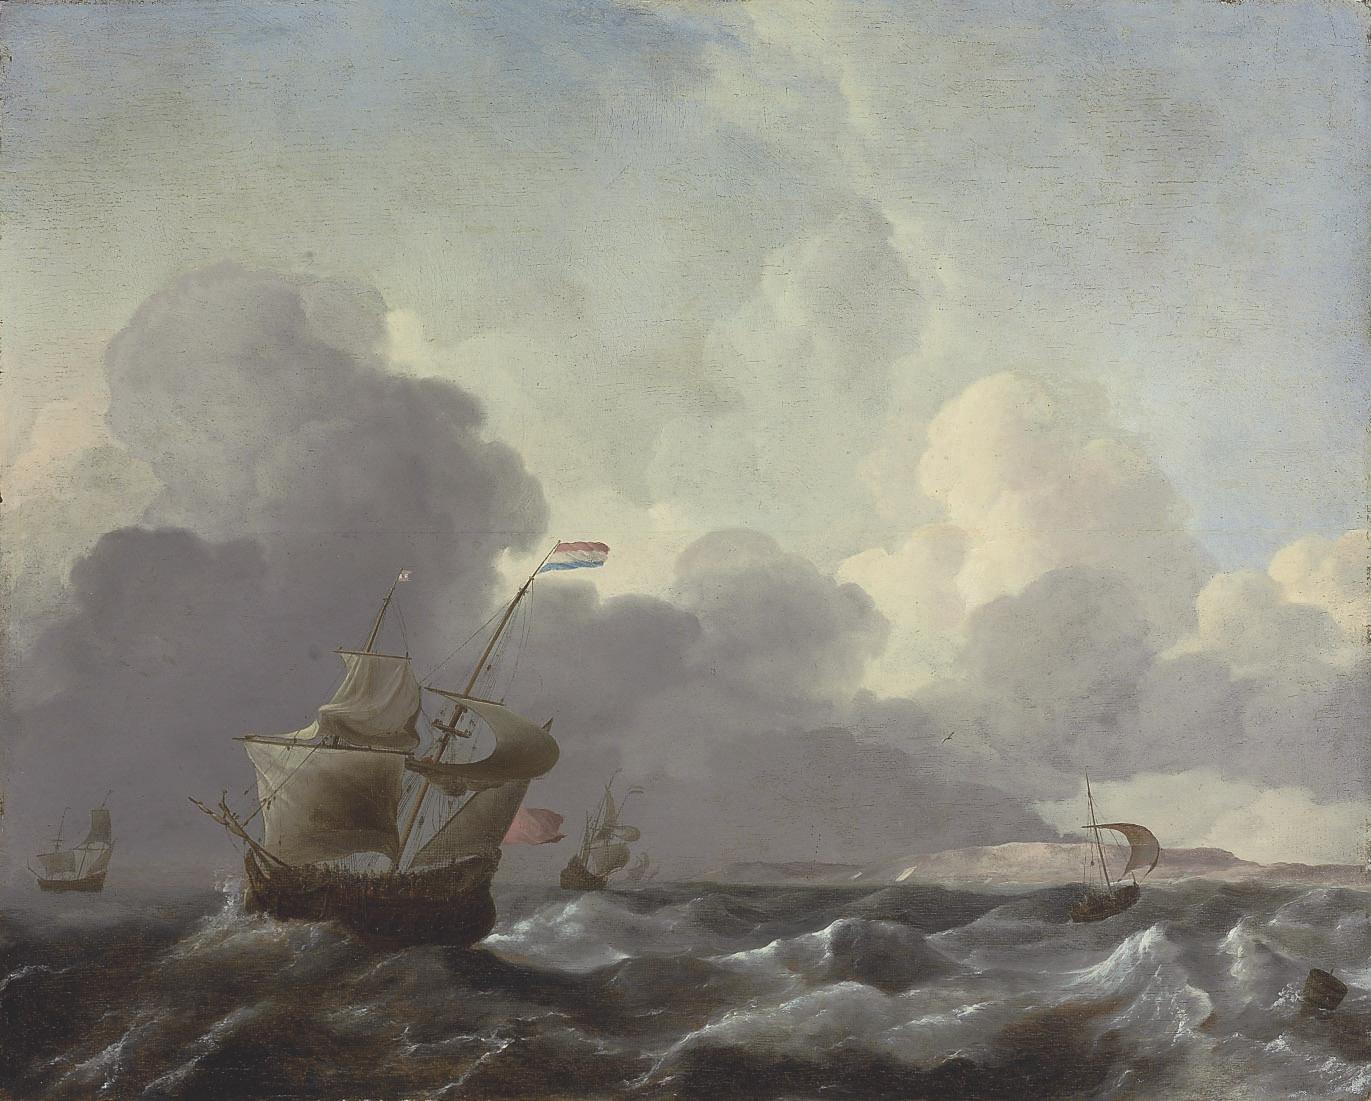 Dutch man-of-war in stormy waters